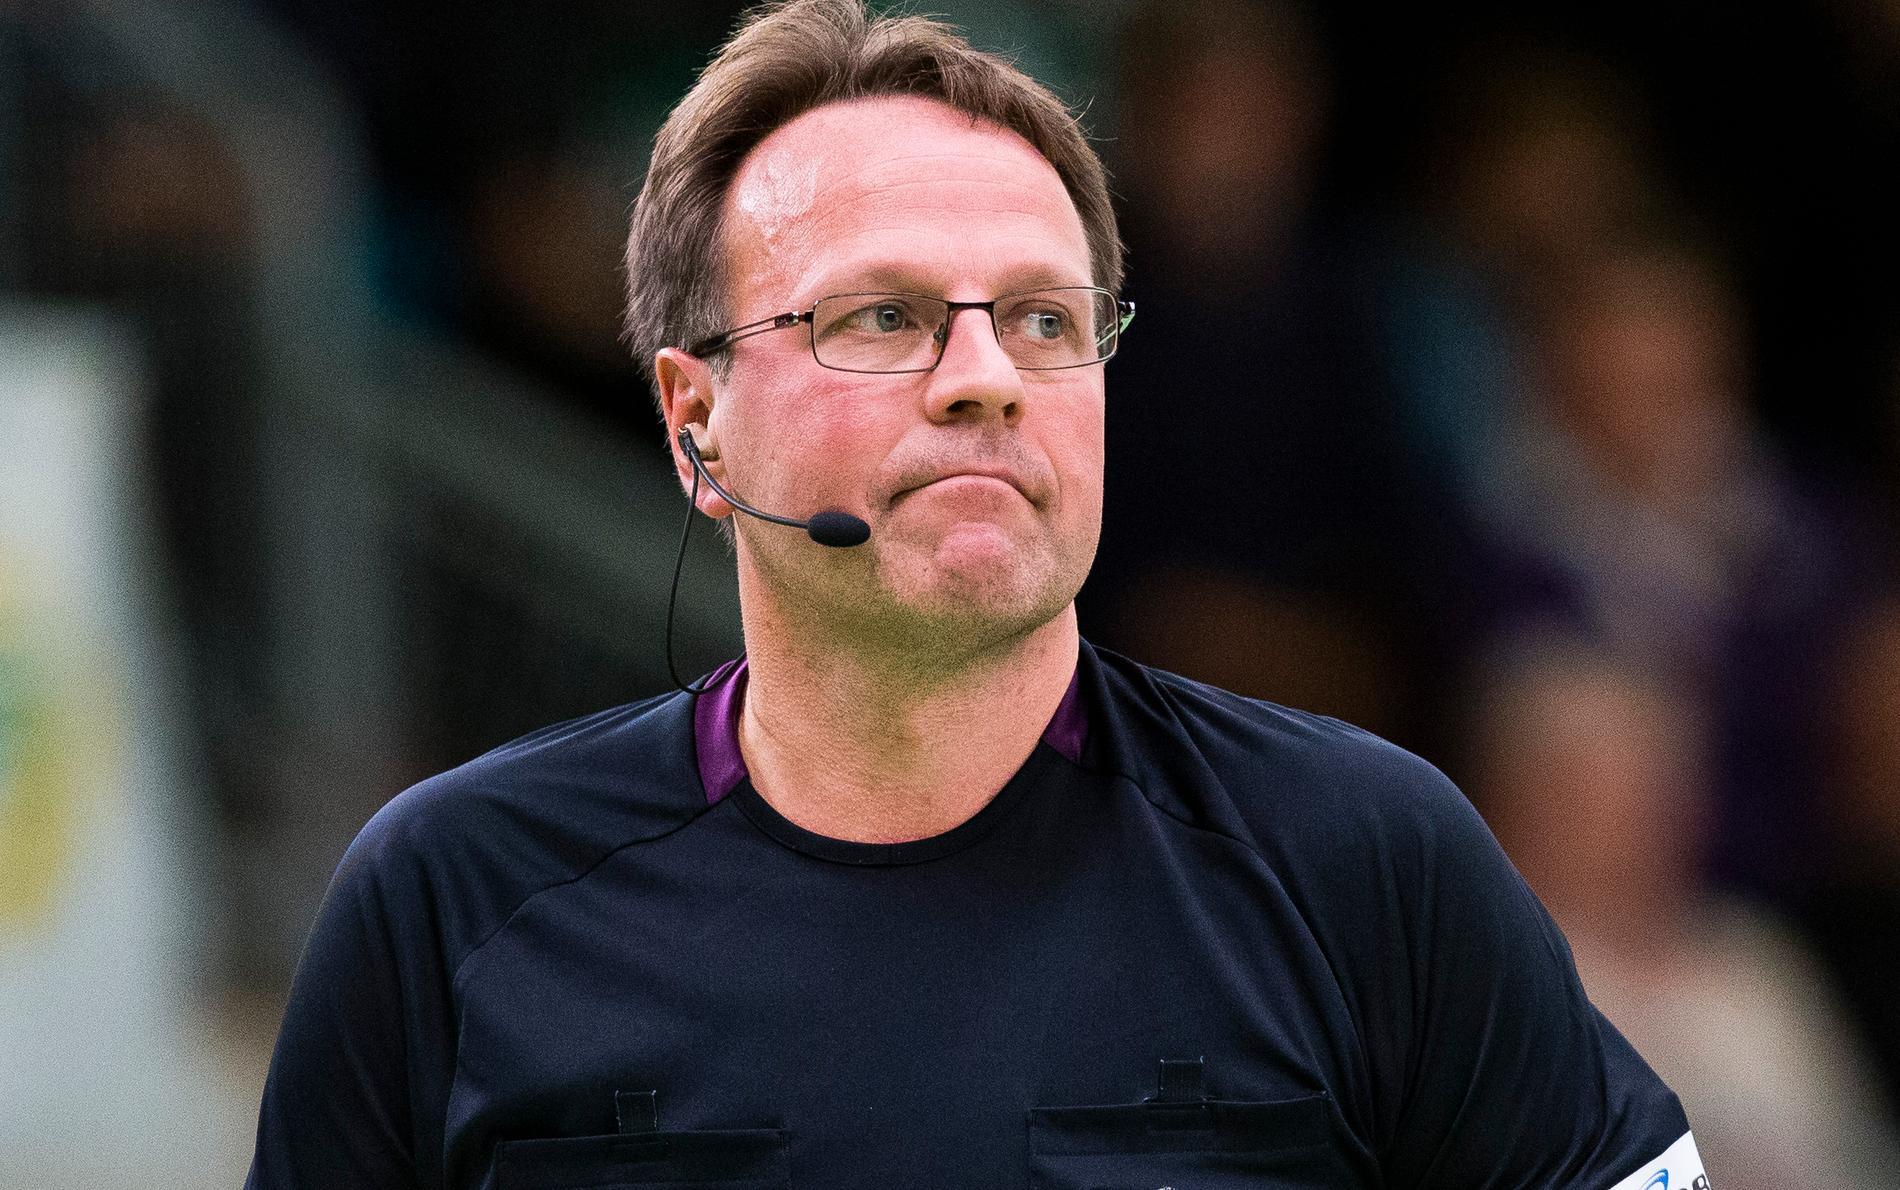 Henrik Mäkinen